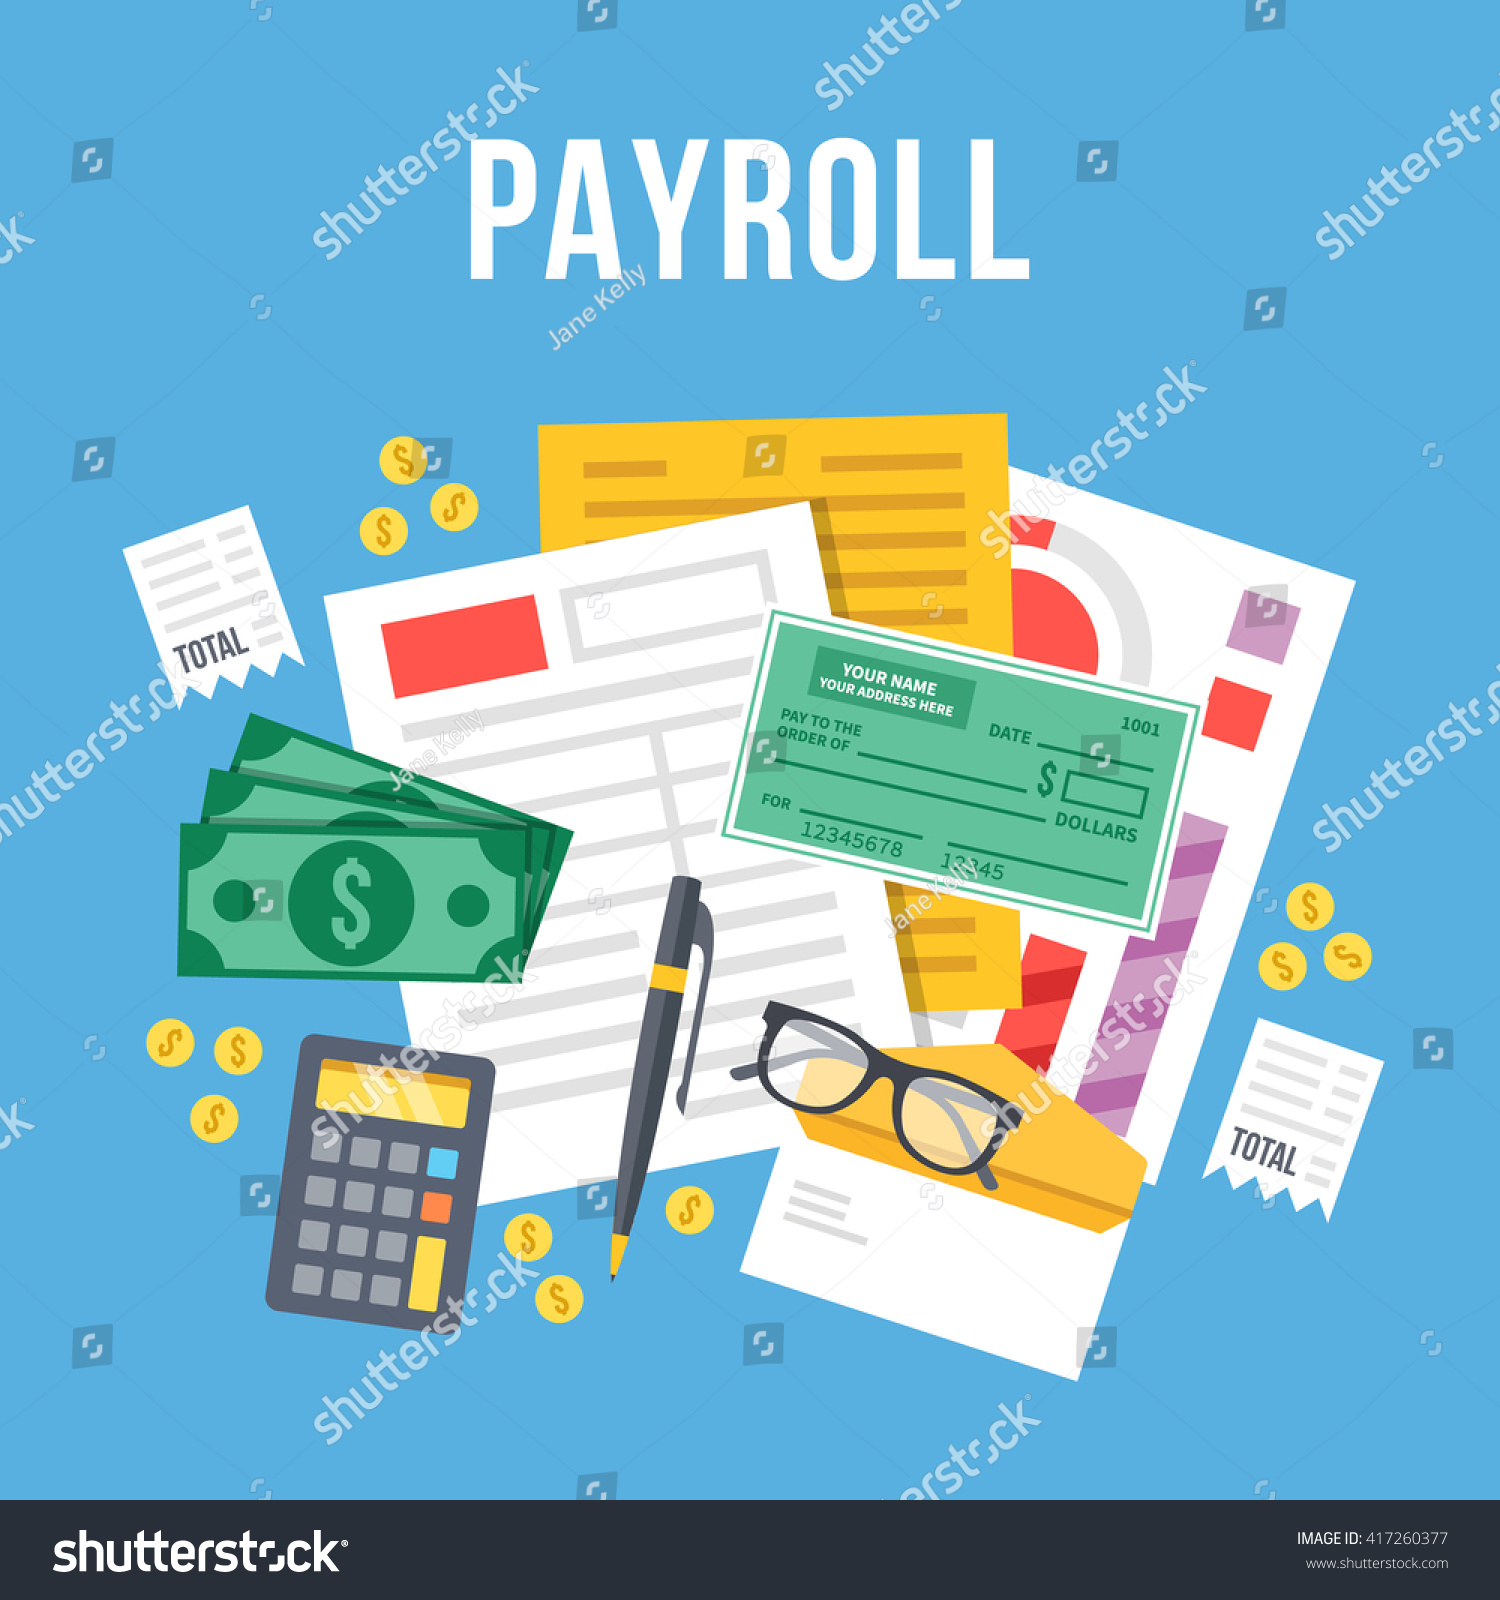 Payroll Invoice Sheet Flat Illustration Payroll Stock